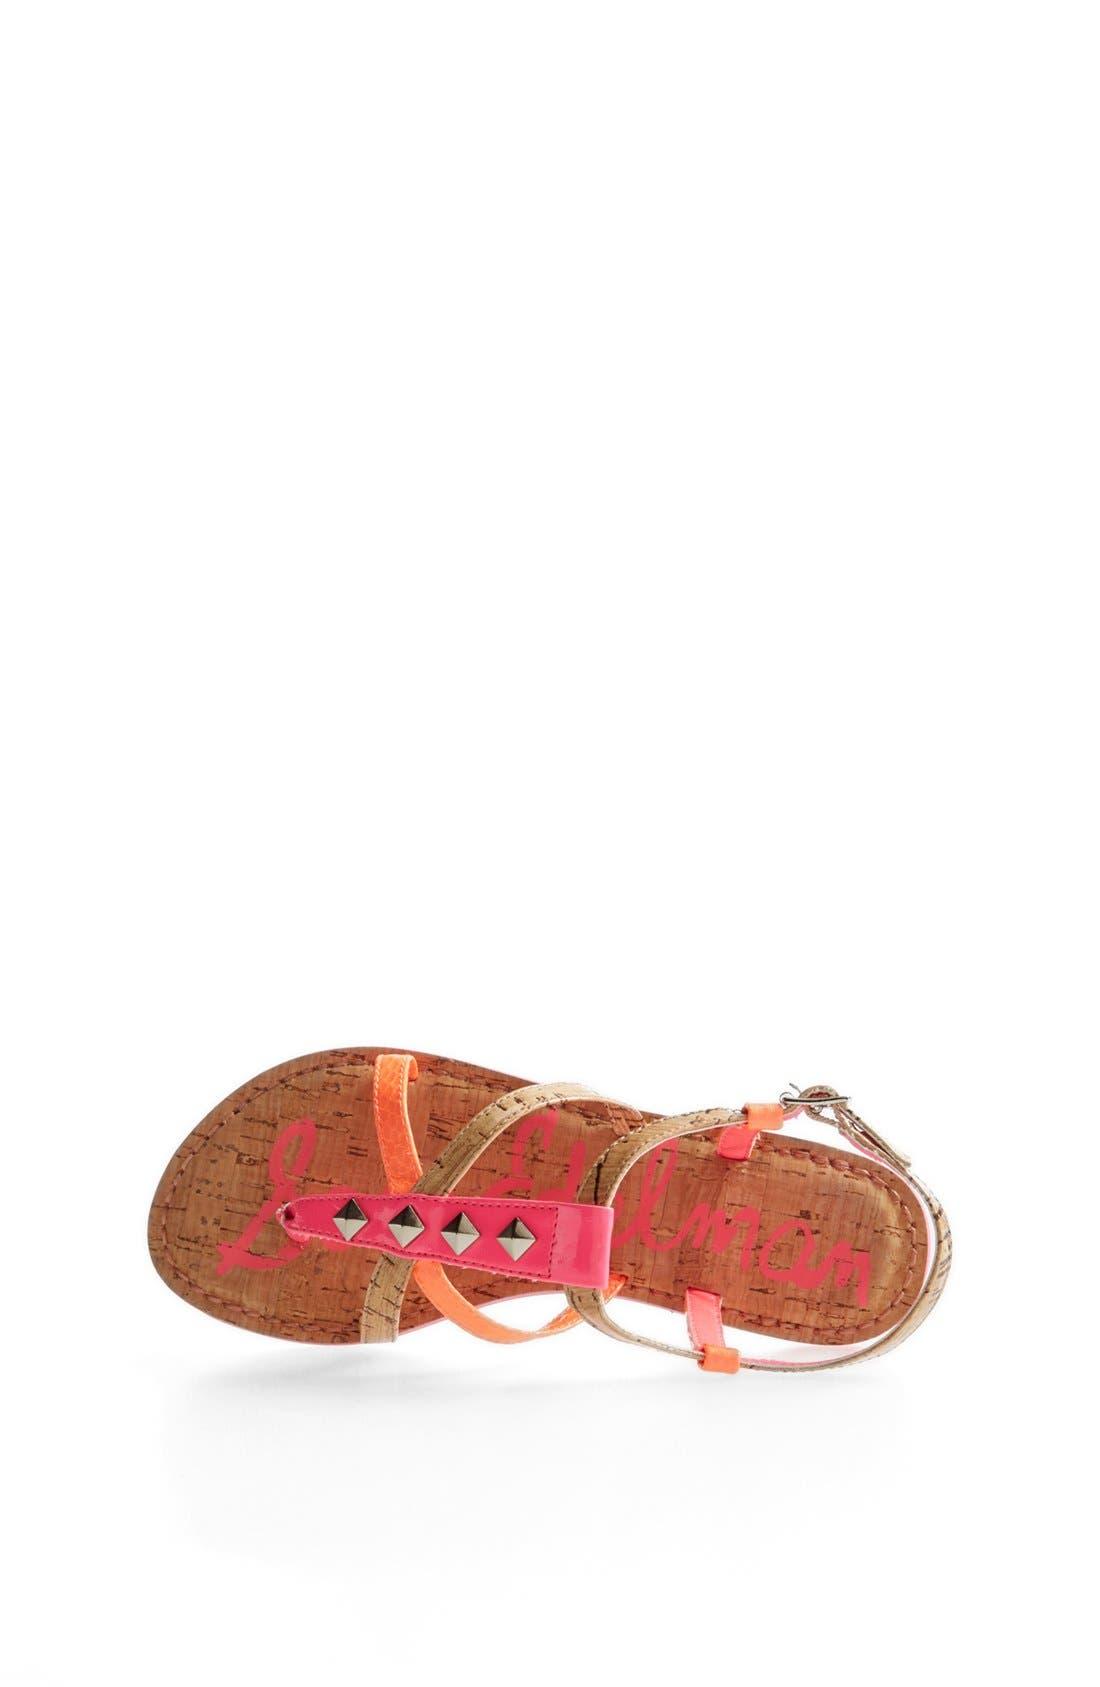 Alternate Image 3  - Sam Edelman 'Gemma' Sandal (Toddler, Little Kid & Big Kid)